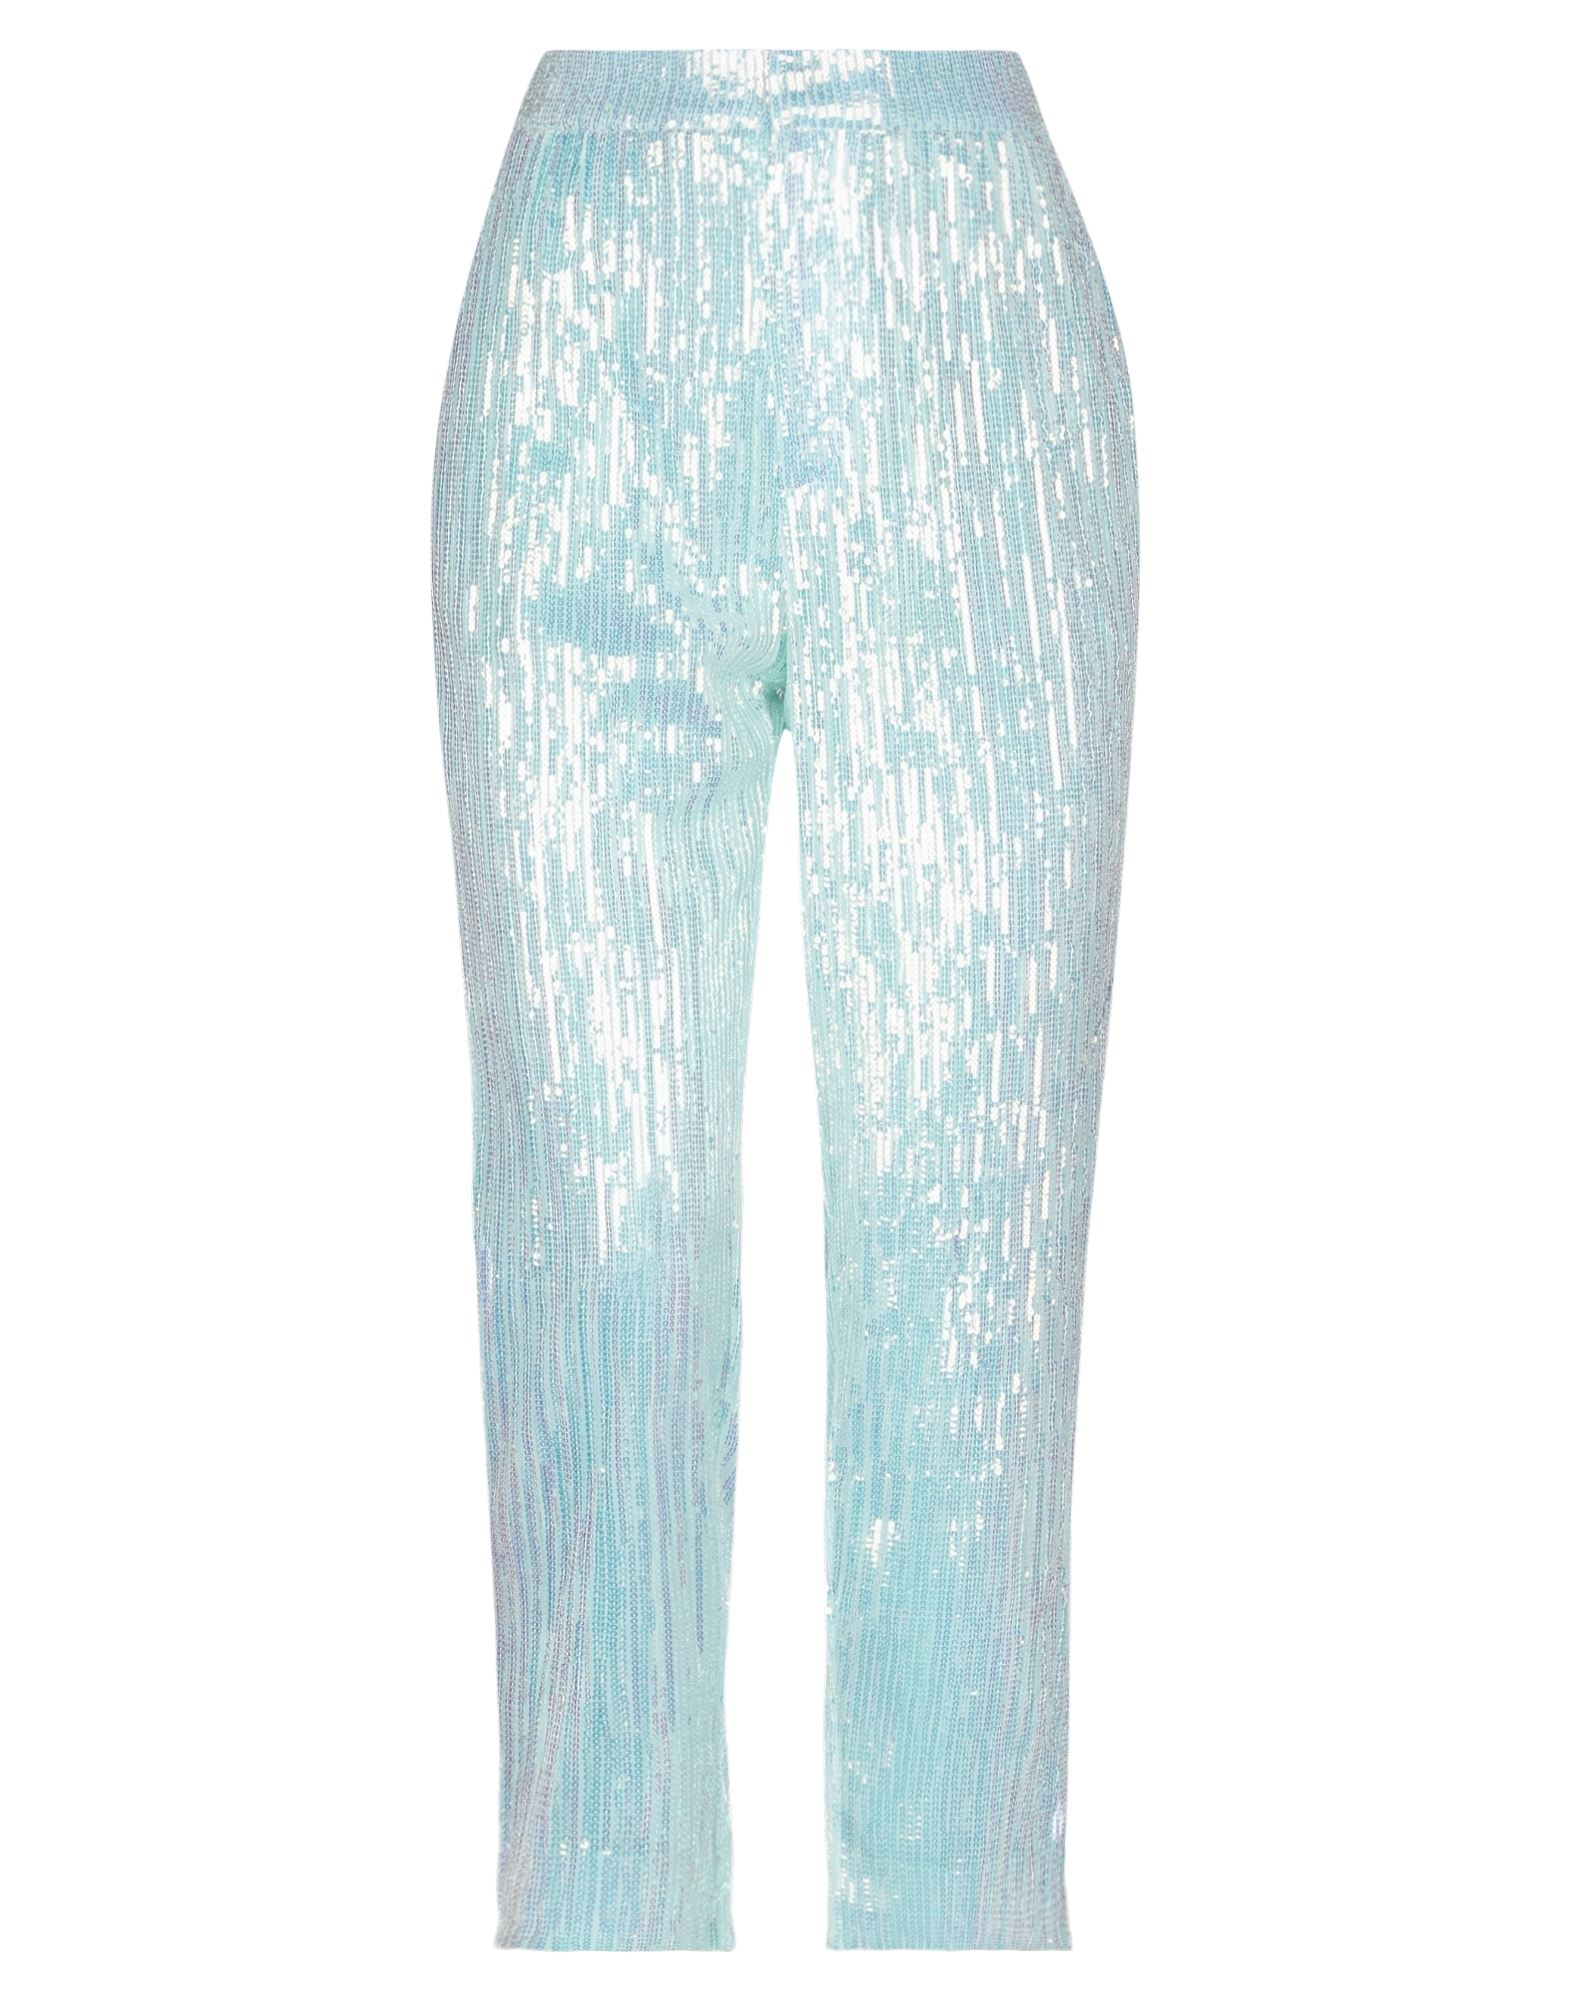 Фото - ISABELLE BLANCHE Paris Повседневные брюки isabelle blanche paris платье миди